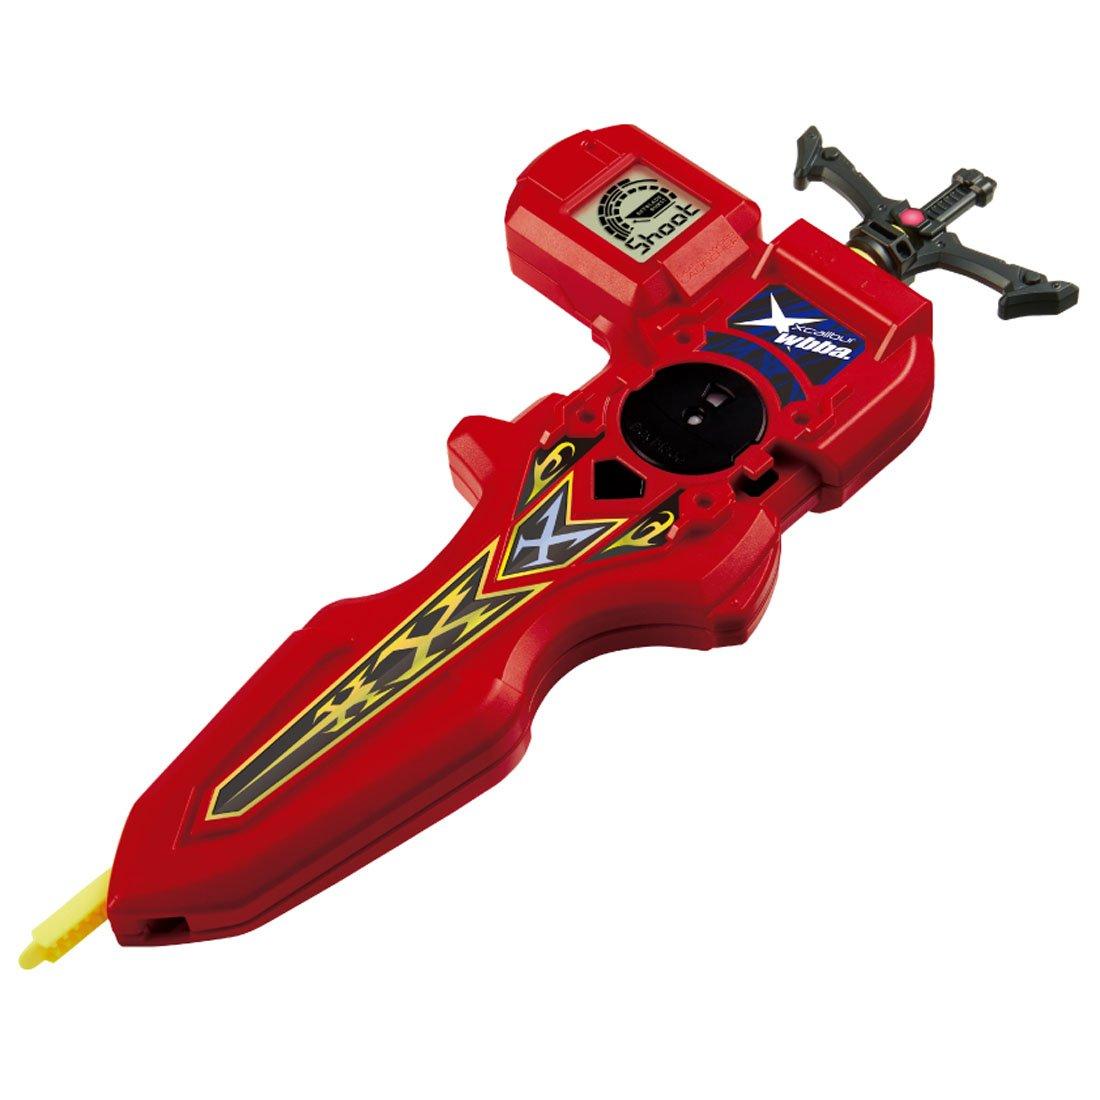 Takaratomy  Beyblade Burst B-94 Digital Sword Launcher, Red by Takara Tomy